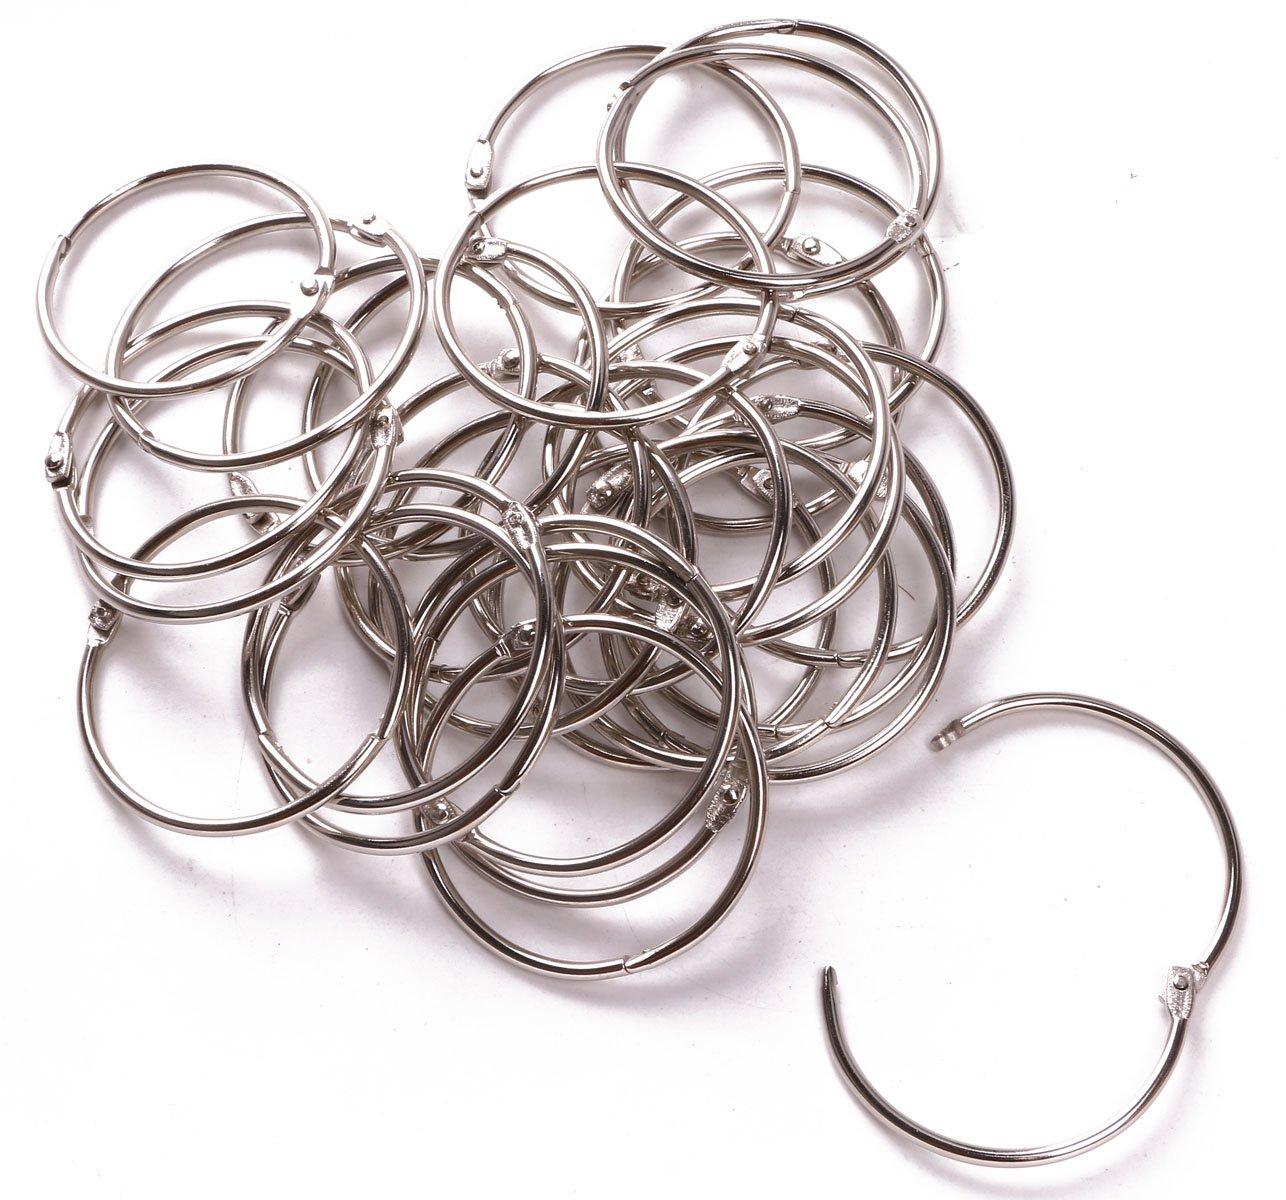 Shapenty 2 Inch/50mm Large Metal Scrapbooking Book Loose Leaf Binder Ring Clip Bulk Key Chain Ring Holder for Photo Paper Card Organization, 30PCS